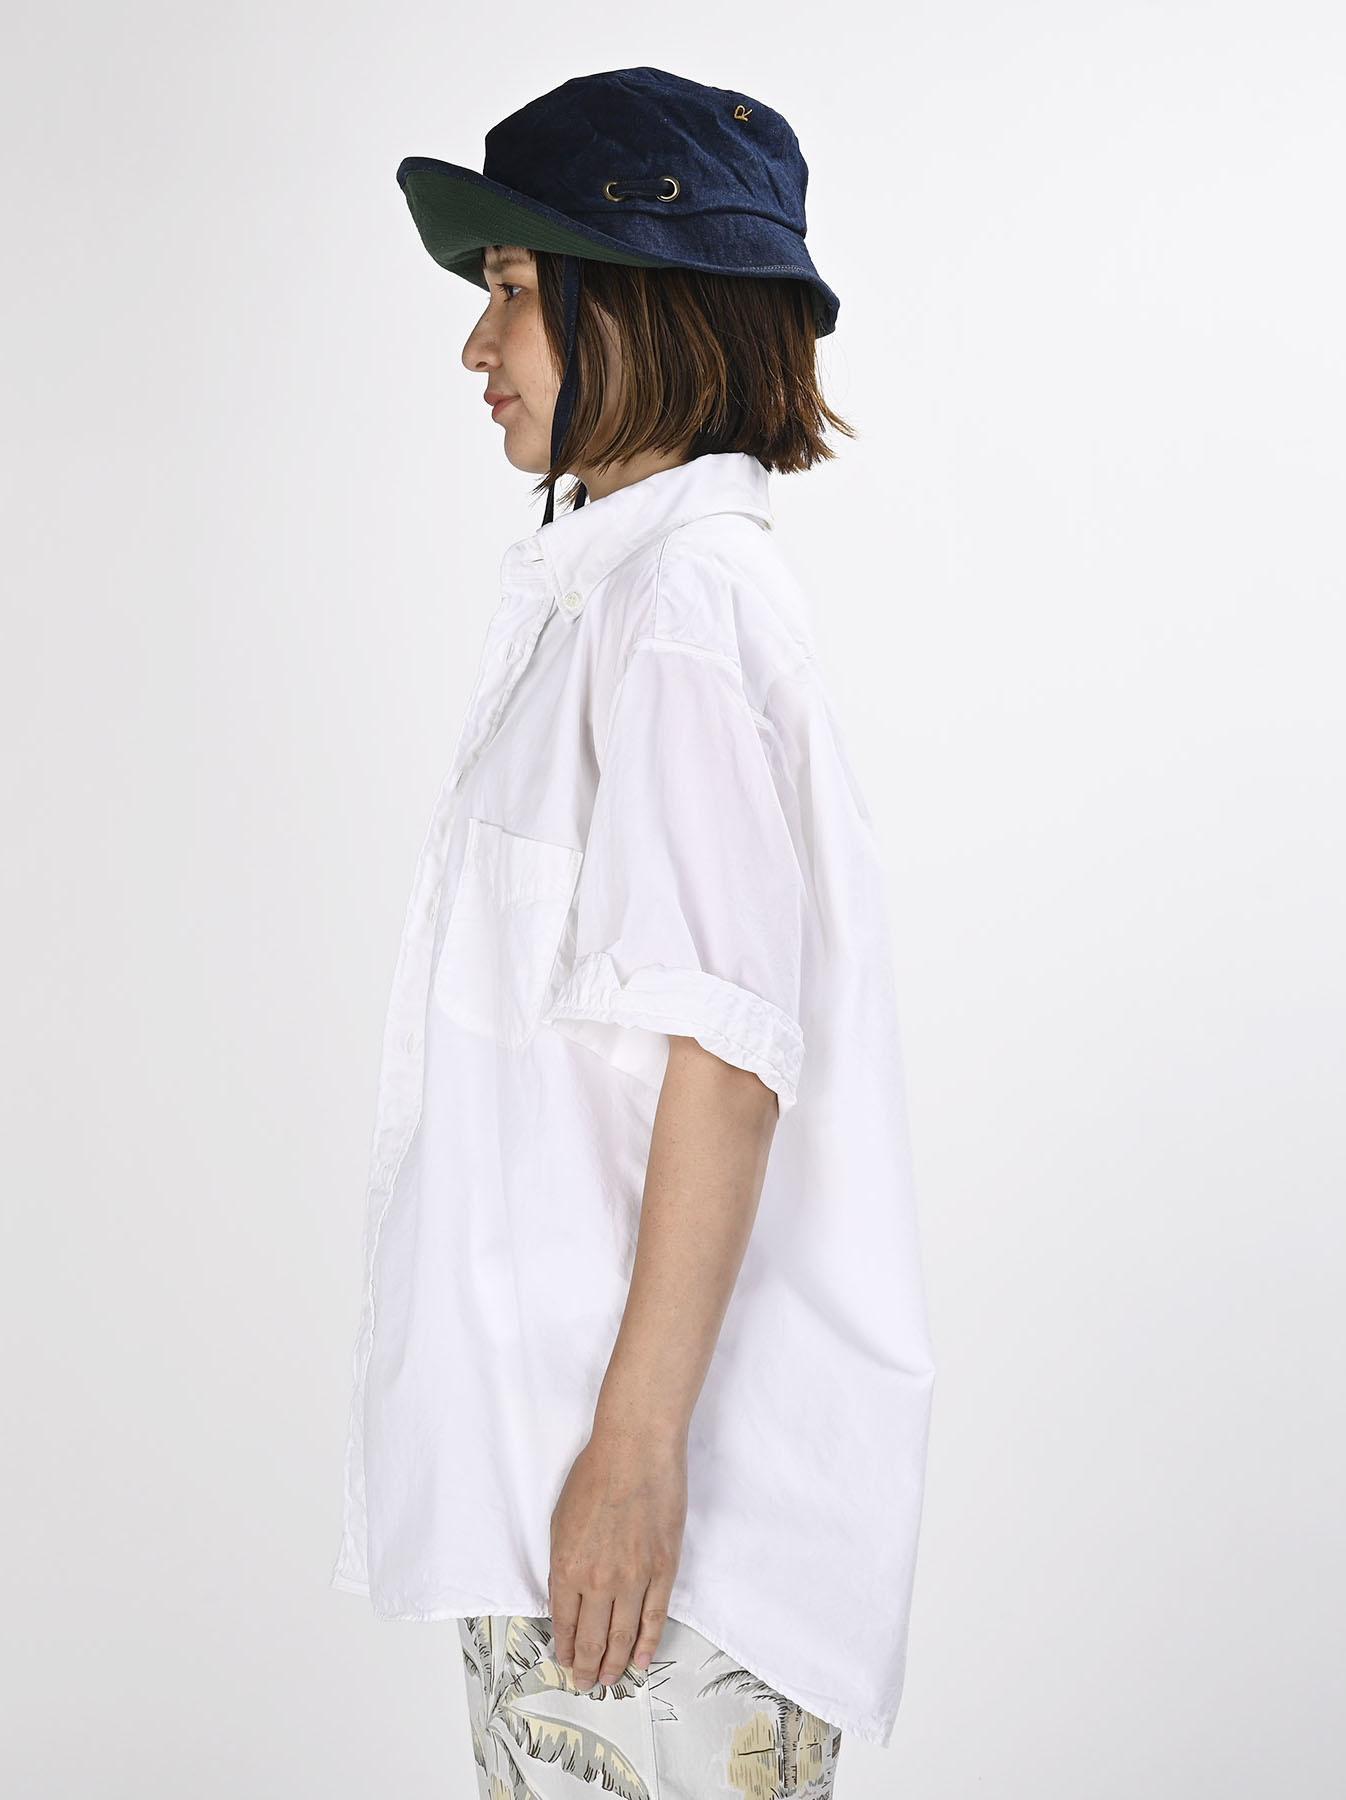 Damp Cotton Anuenue Ocean Shirt (0621)-10